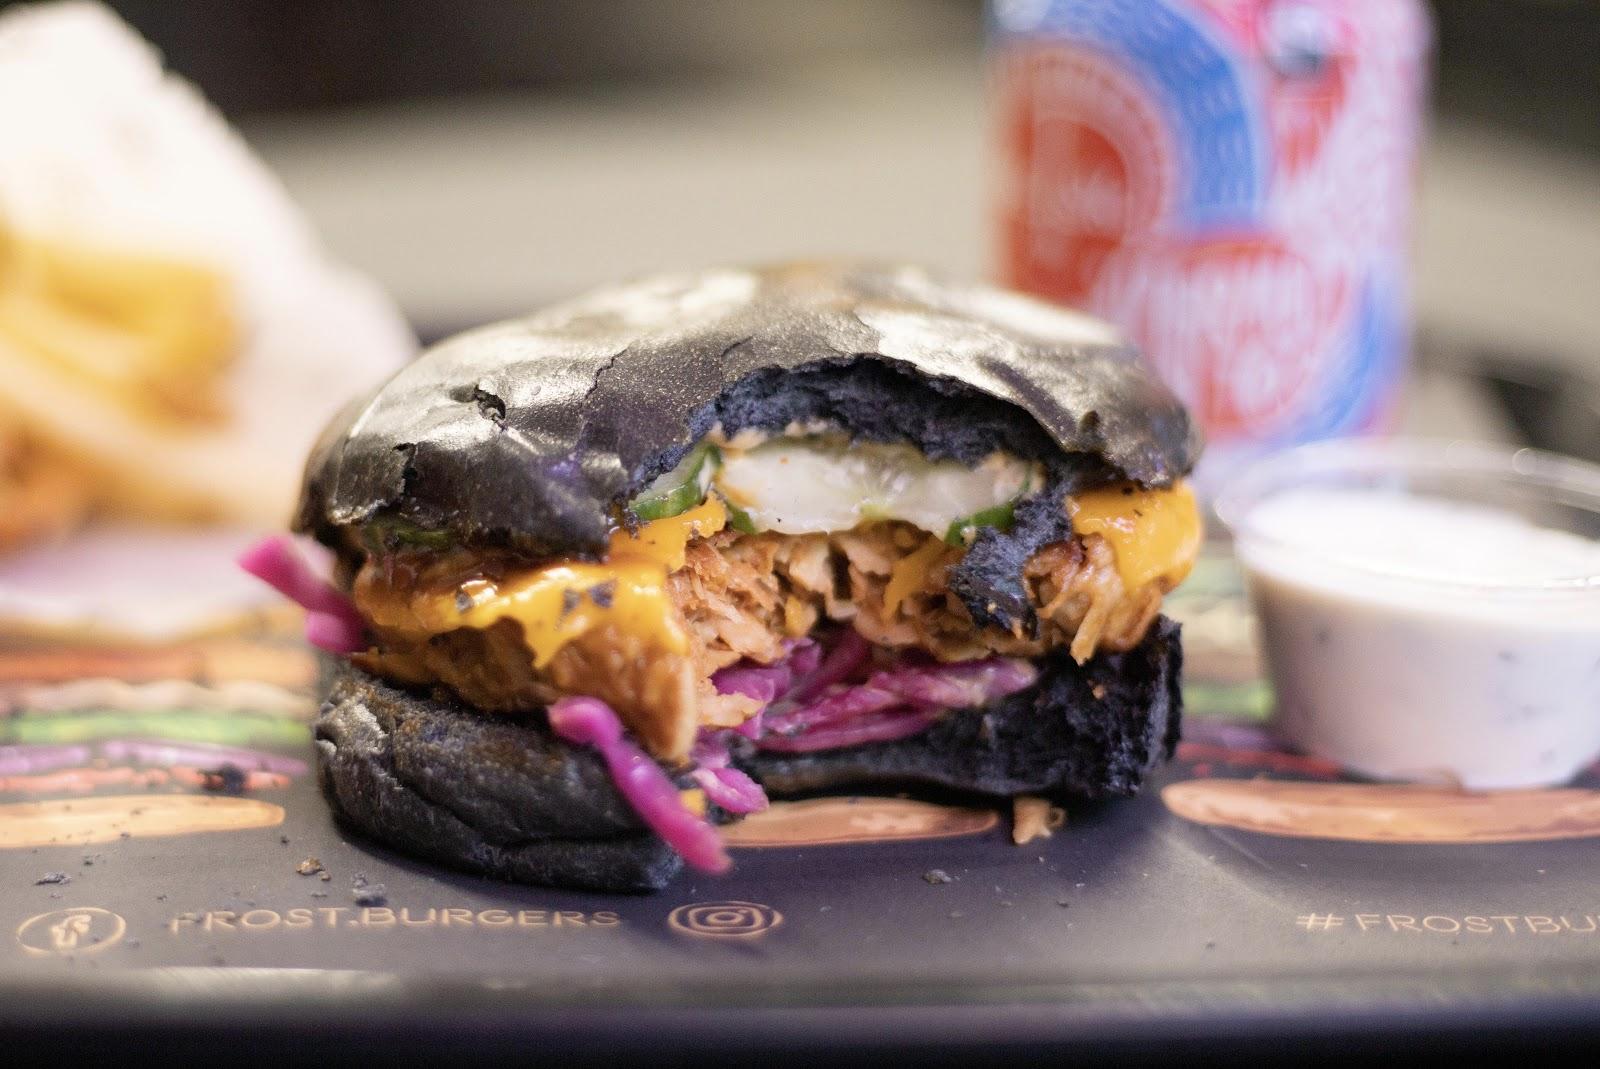 Halloween burger Liverpool Frost